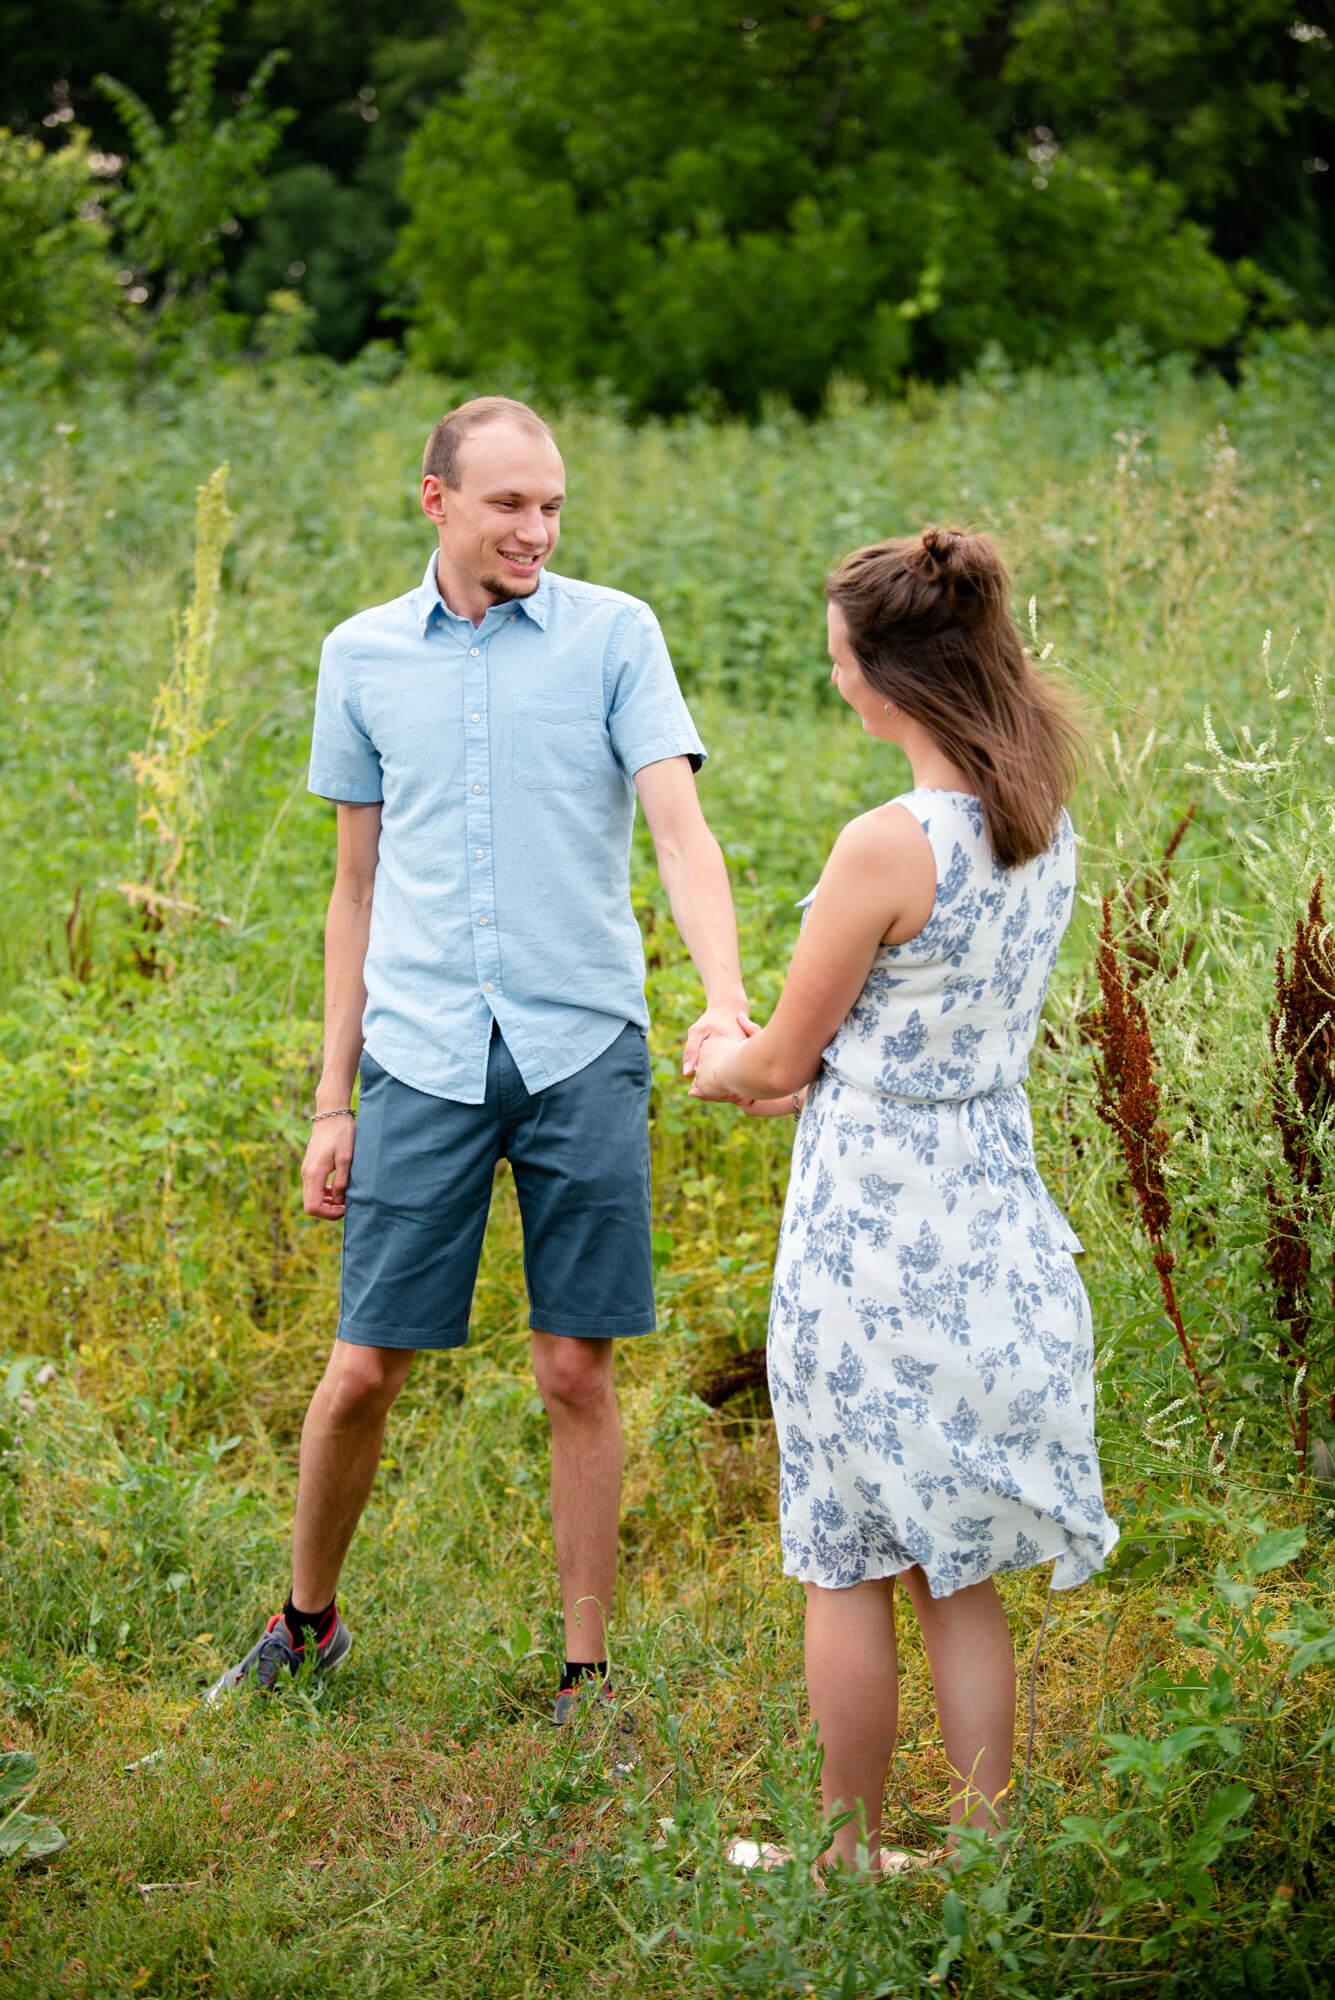 DSC 5042 - John and Faith's Engagement   Fargo, North Dakota